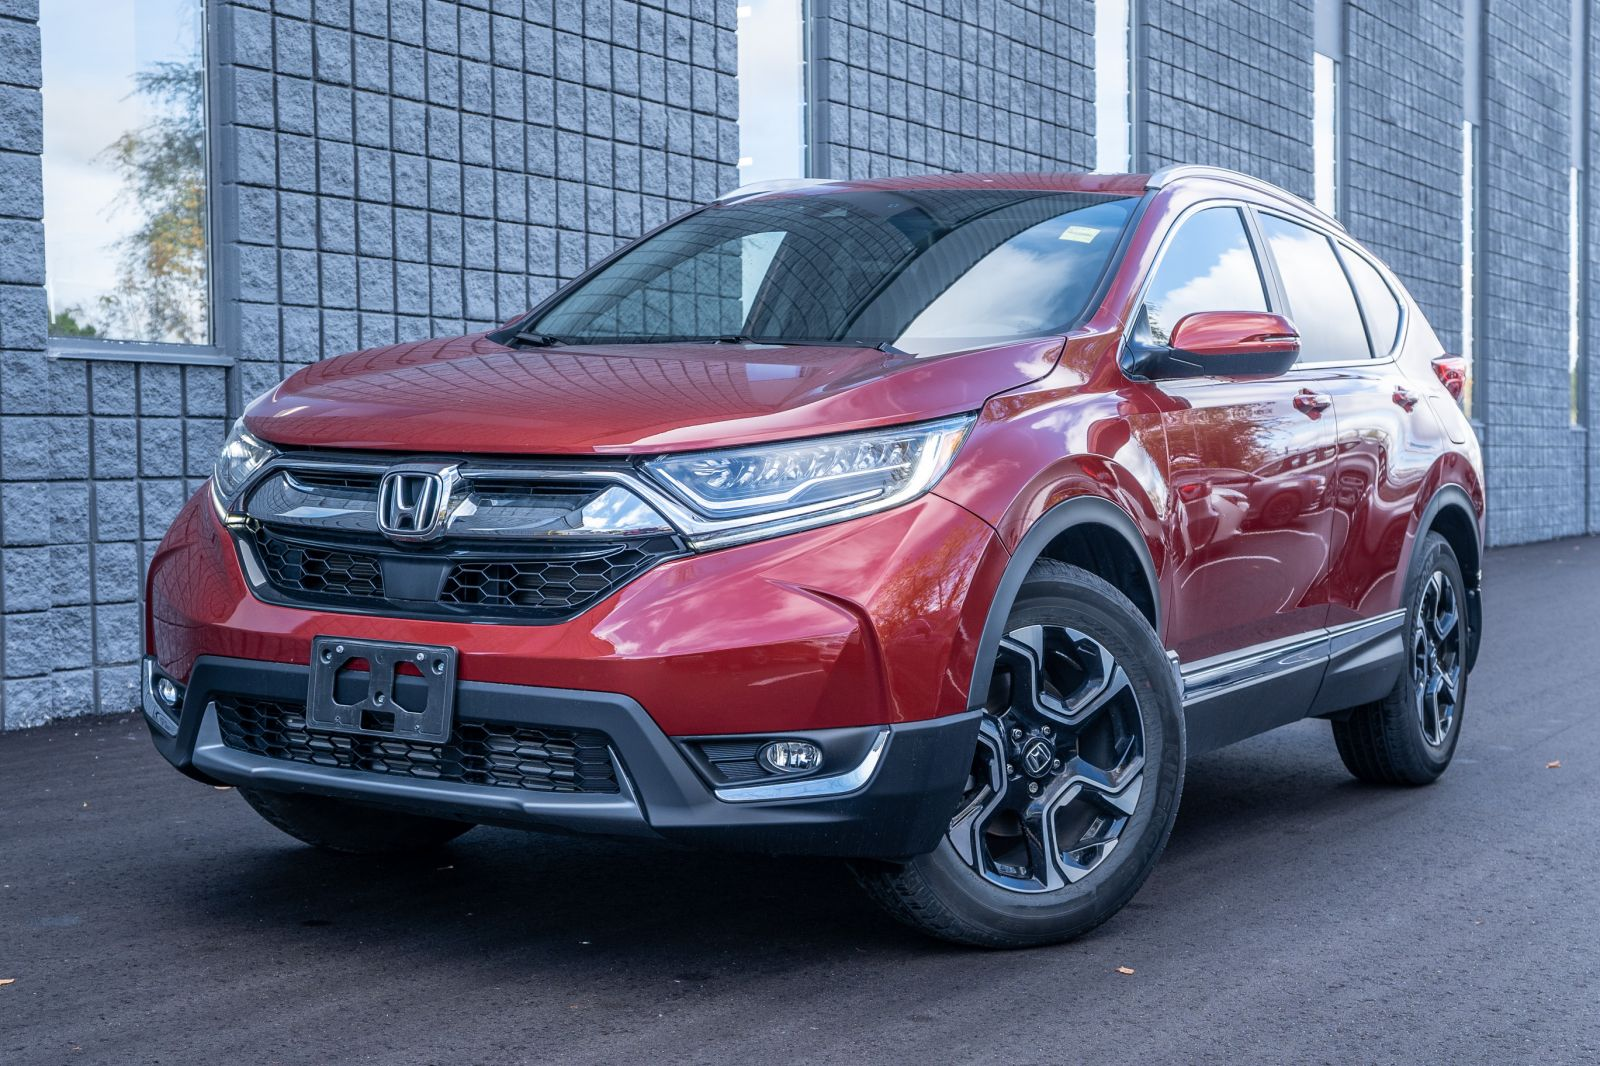 2017 Honda CR-V Touring|Blind Spot Monitor|Heated Seats| Heated Steering Wheel|Navigation